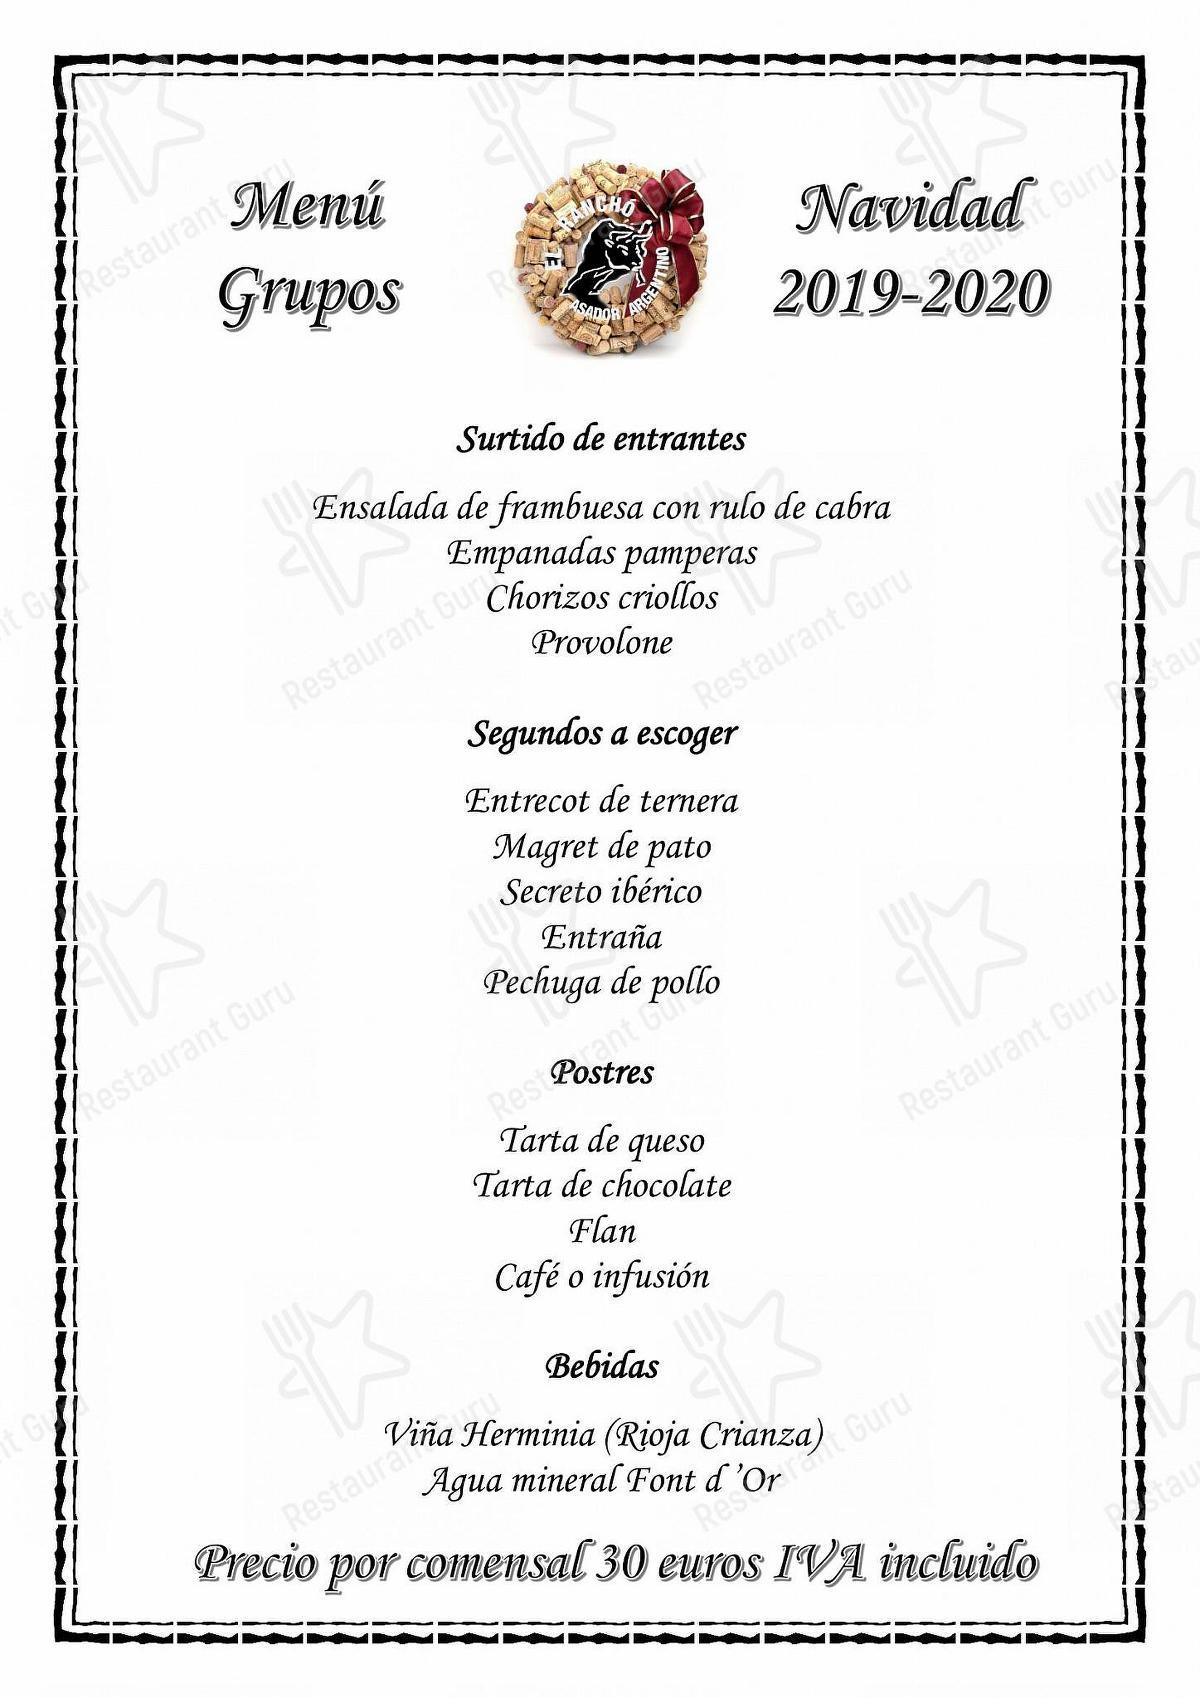 Menu for the El Rancho Asador Argentino steakhouse